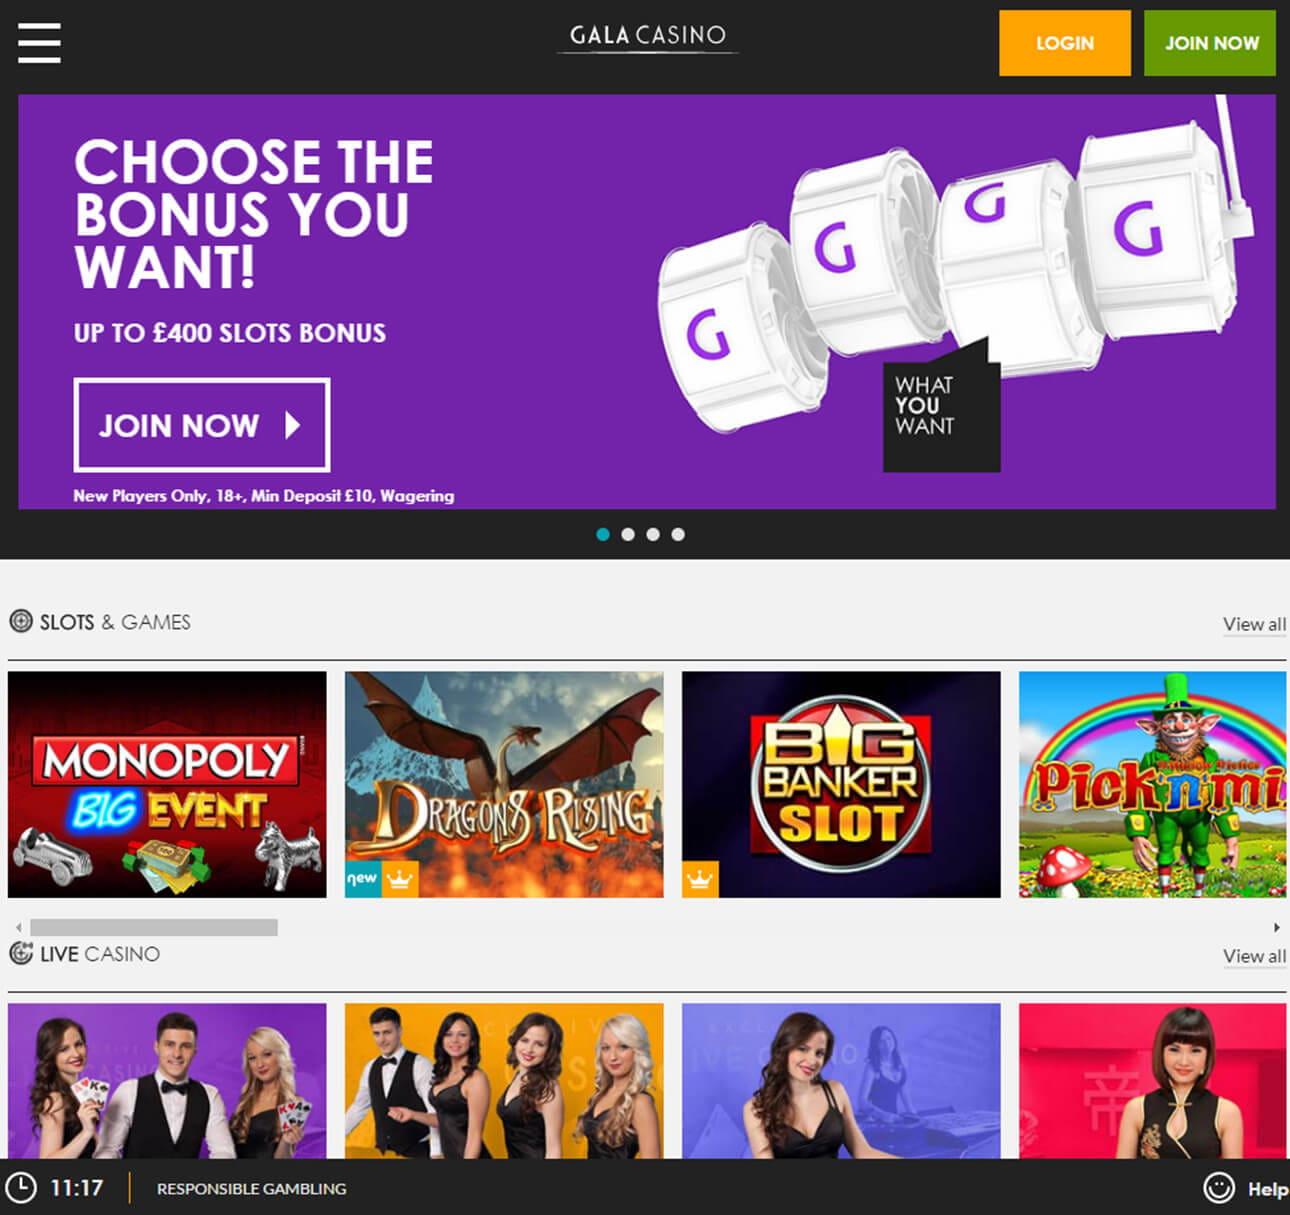 Gala casino jobs in glasgow poke a penguin 2 game